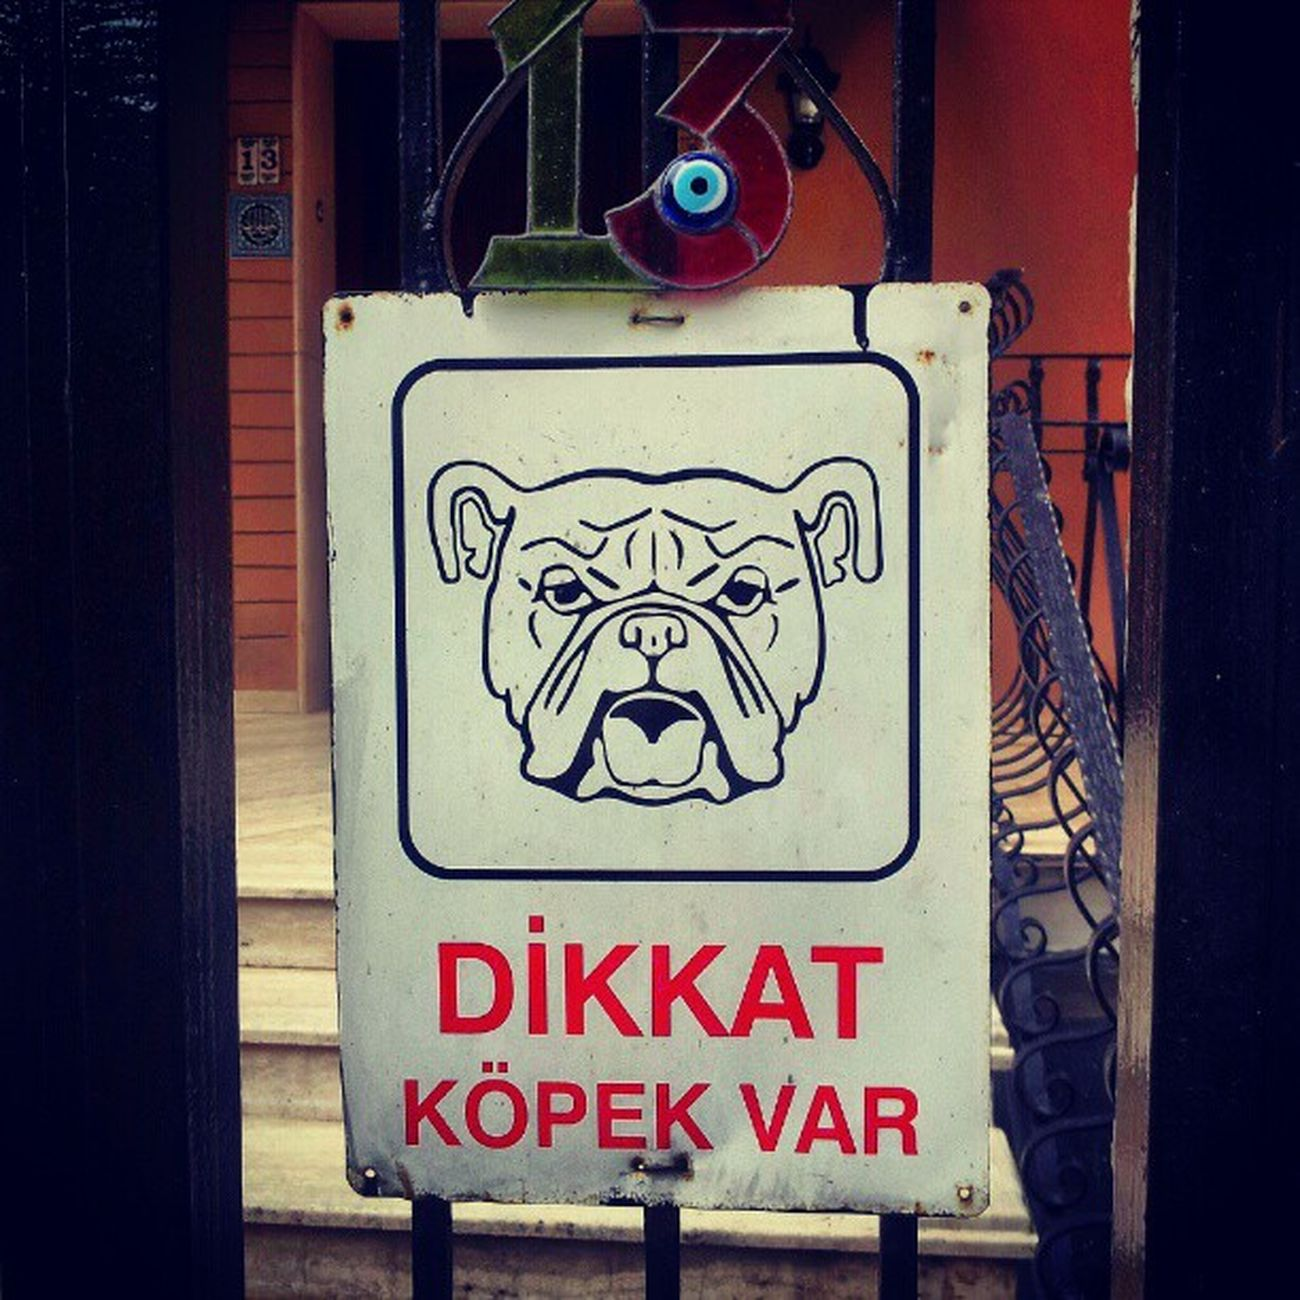 Dikkatköpekvar Dangerdog